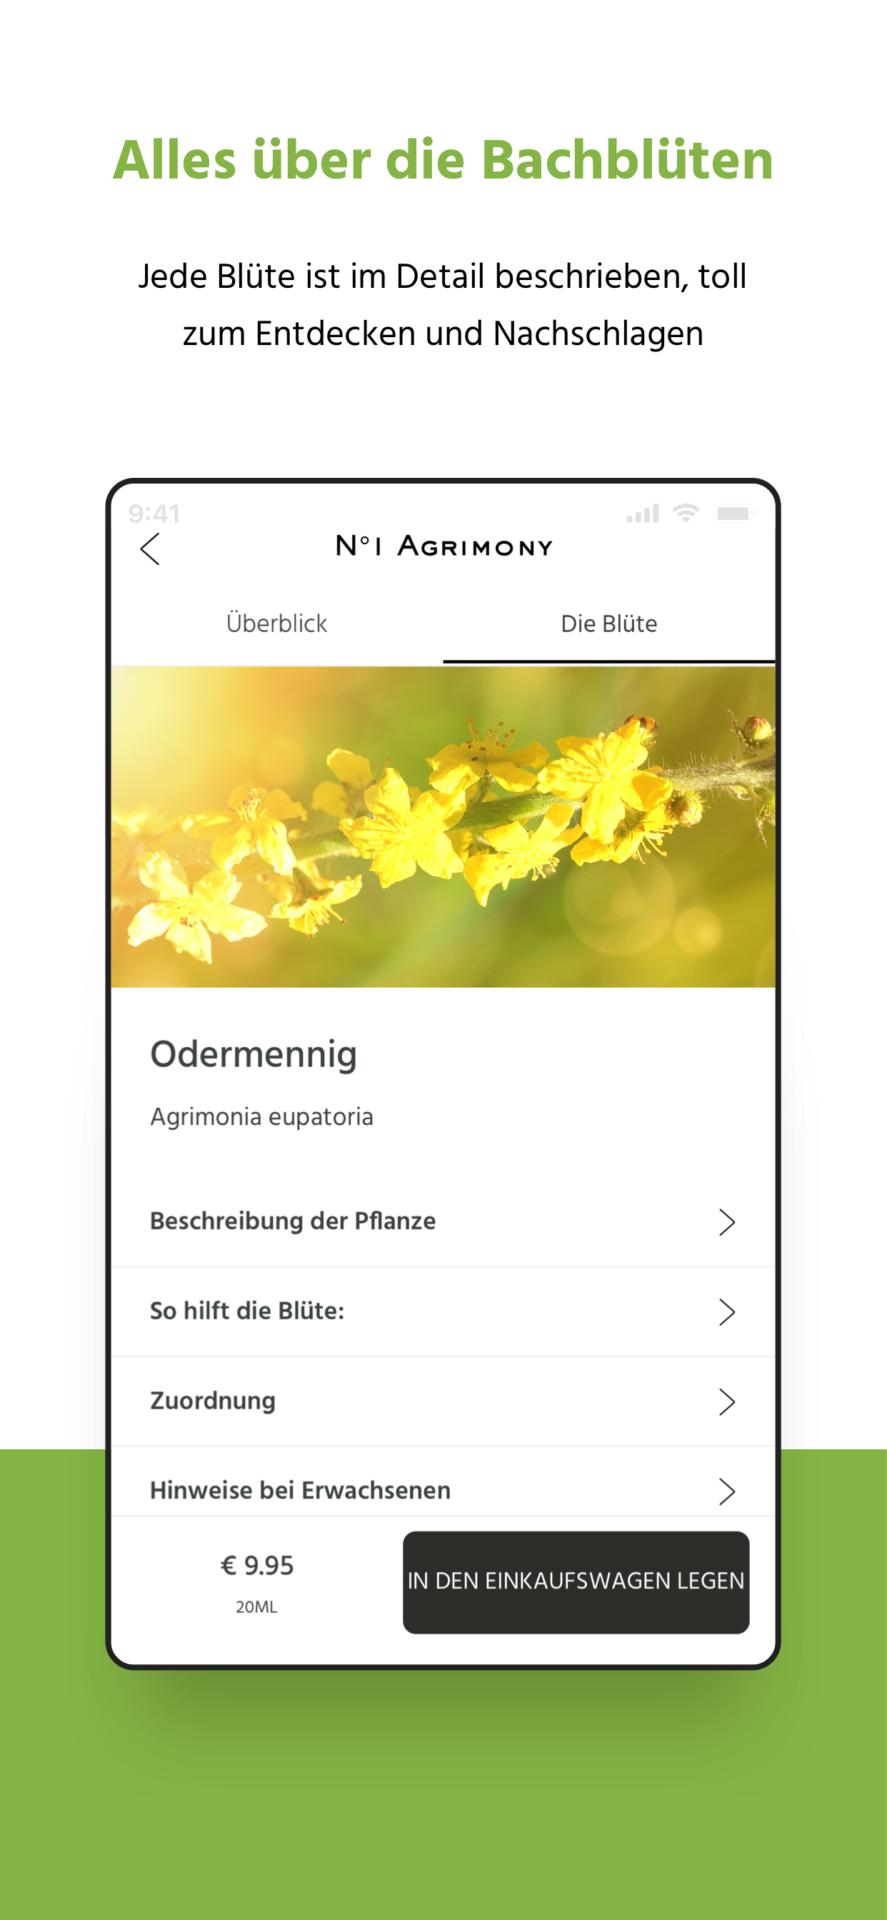 Original Bachblüten App Dr. Bach Lemon Pharma